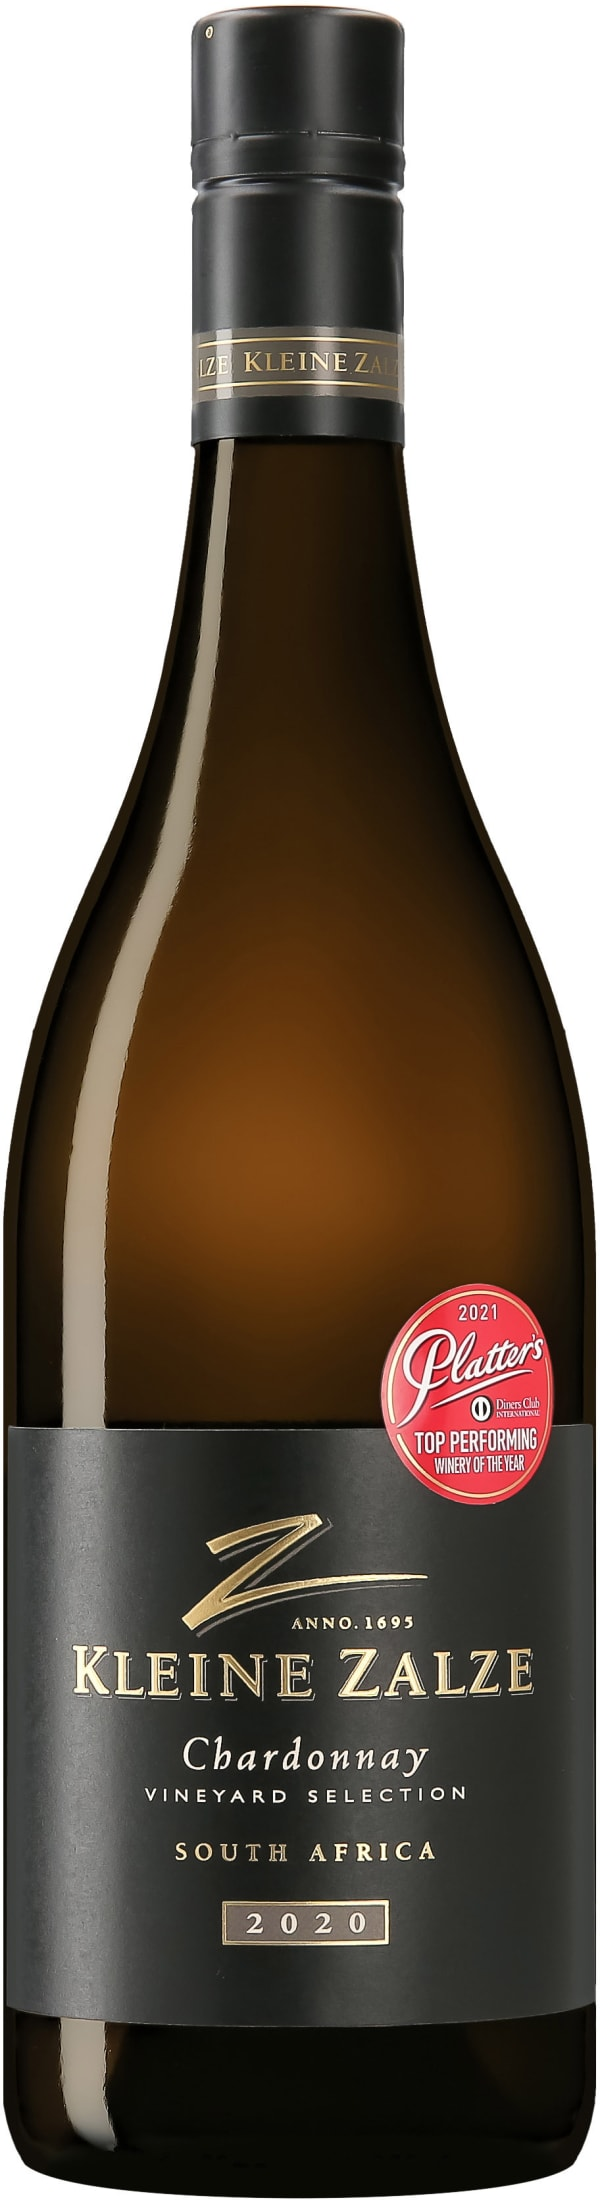 Kleine Zalze Vineyard Selection Chardonnay 2017